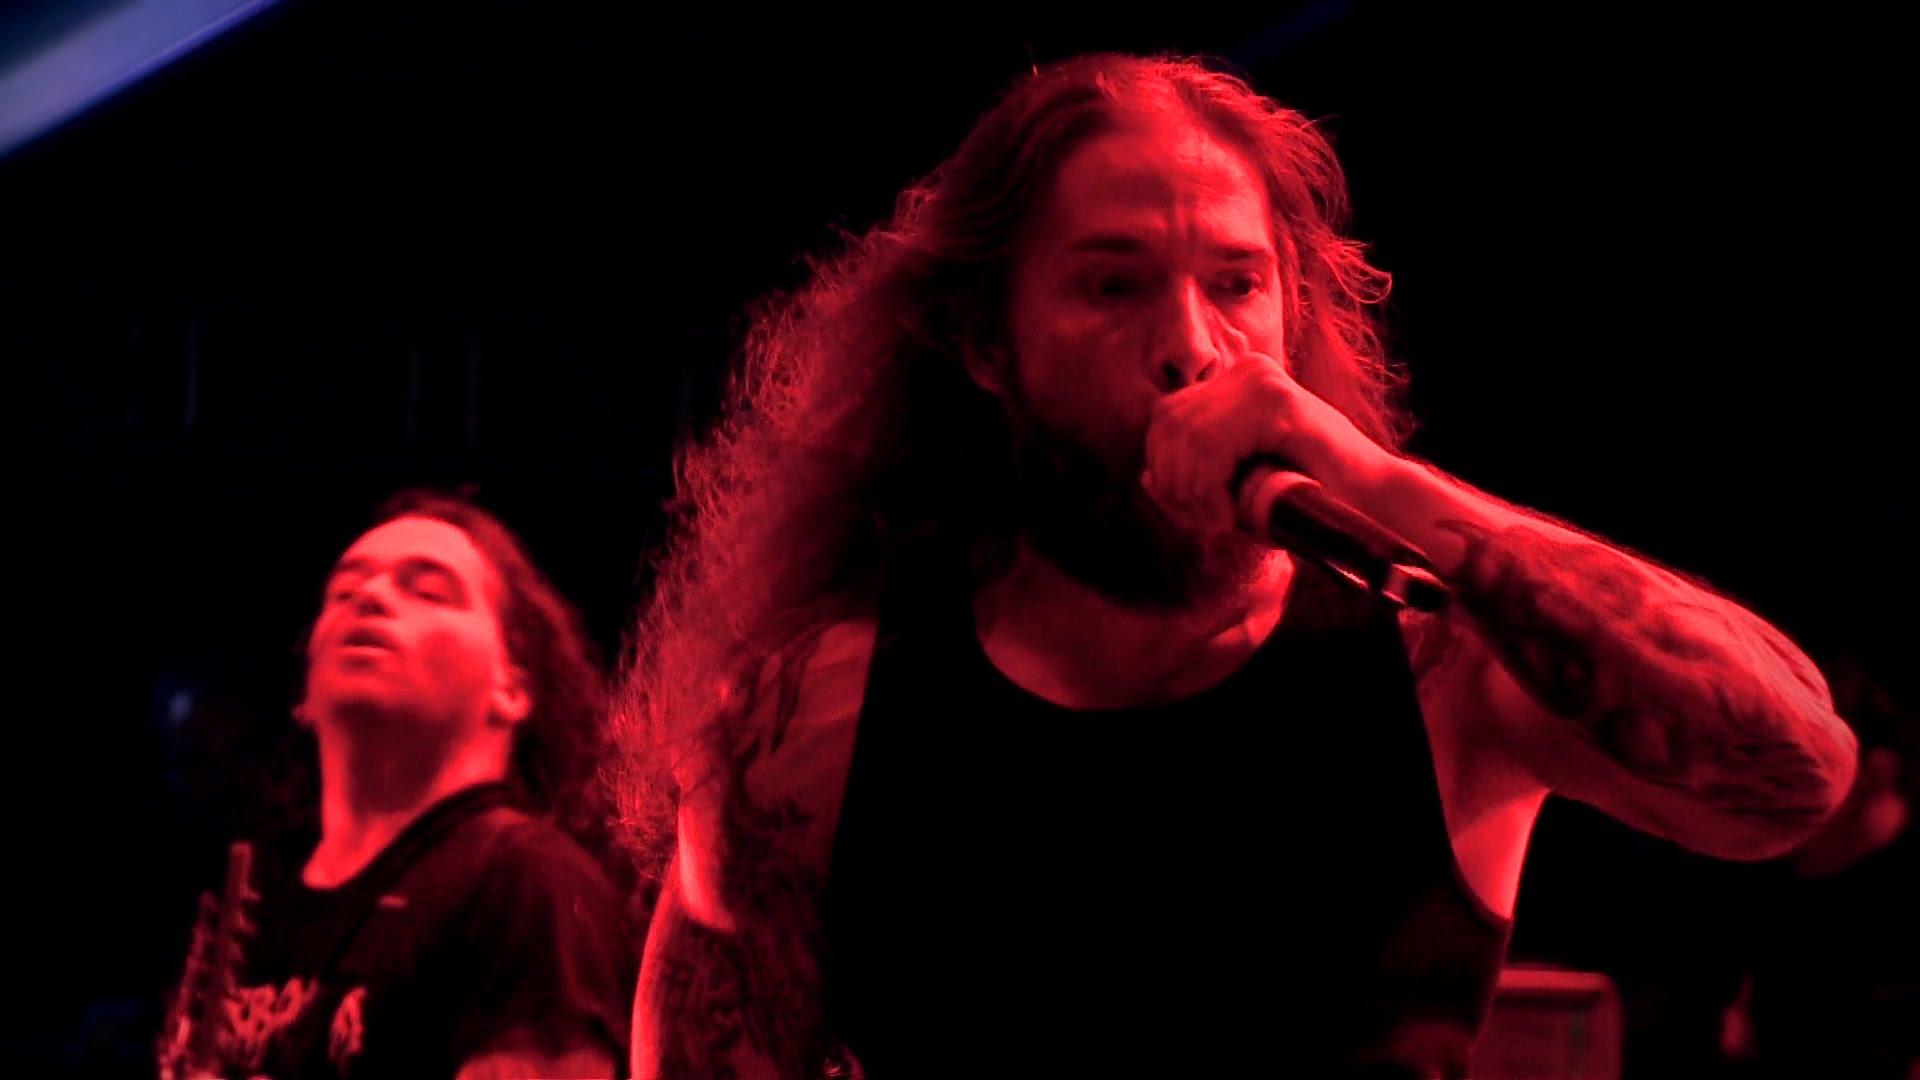 BROKEN HOPE - The Docking Dead (OFFICIAL LIVE VIDEO)